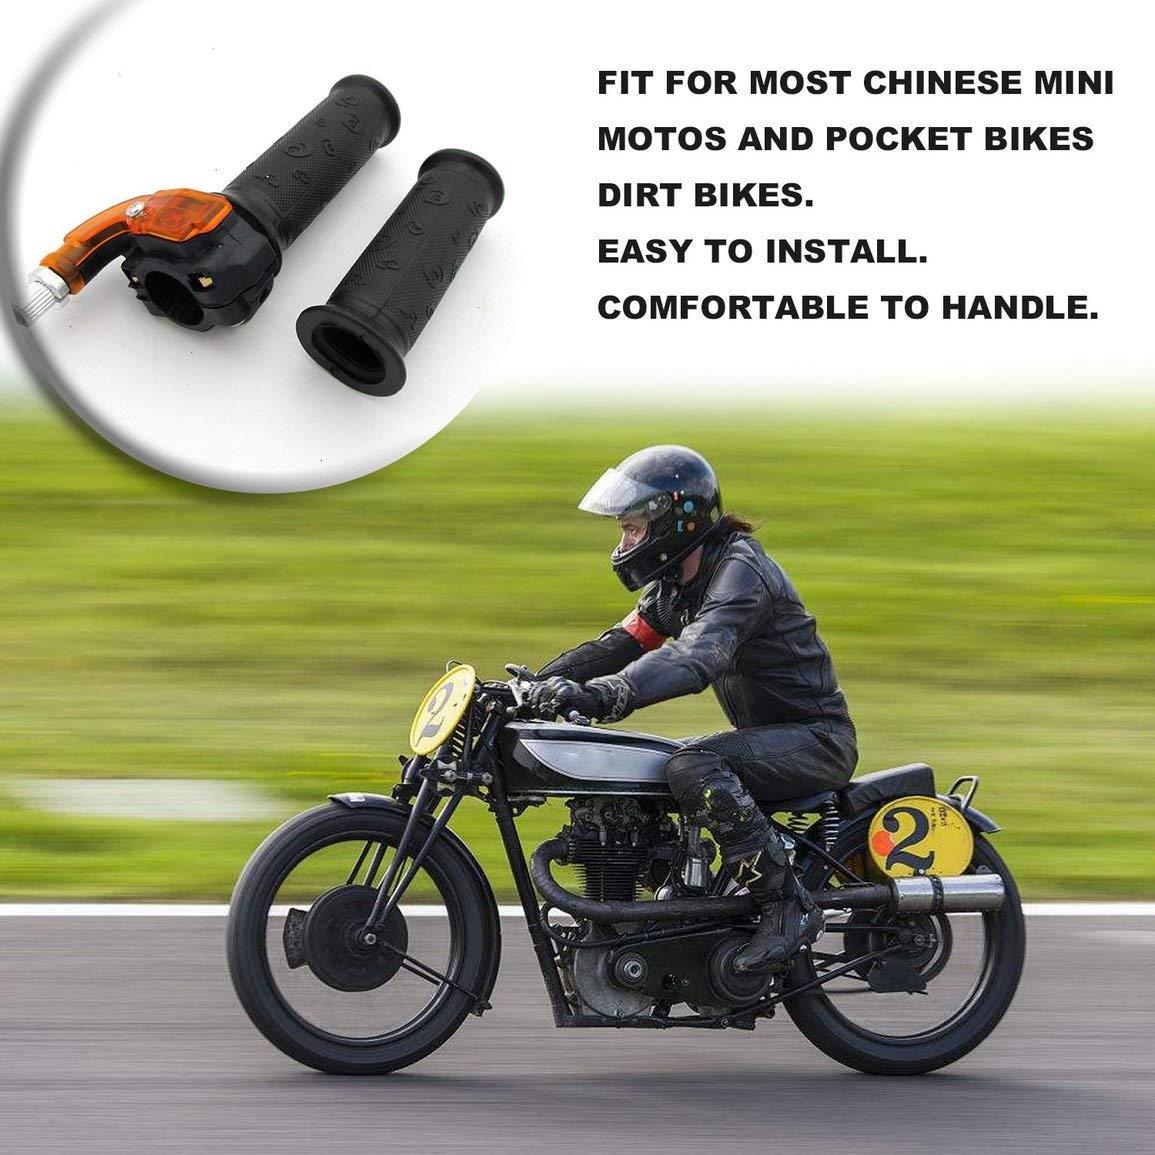 Griff Gasgriff Klemme 49cc Pocket Bike Mini Moto Quads Twist Drossel-Gaspedal Grip leoboone 22mm 7//8